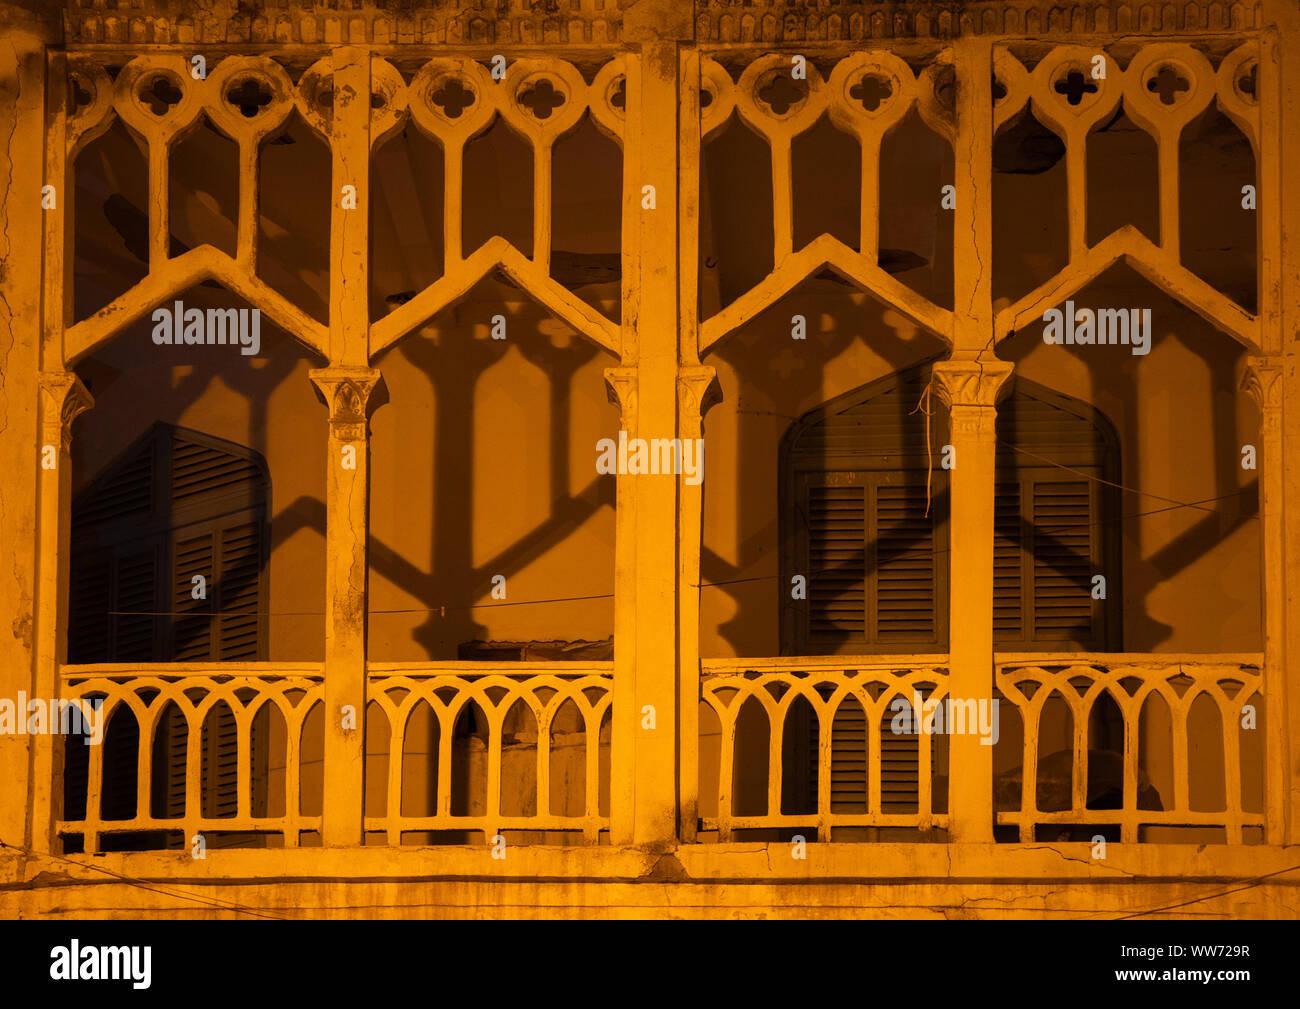 old Ottoman architecture building, Northern Red Sea, Massawa, Eritrea Stock Photo